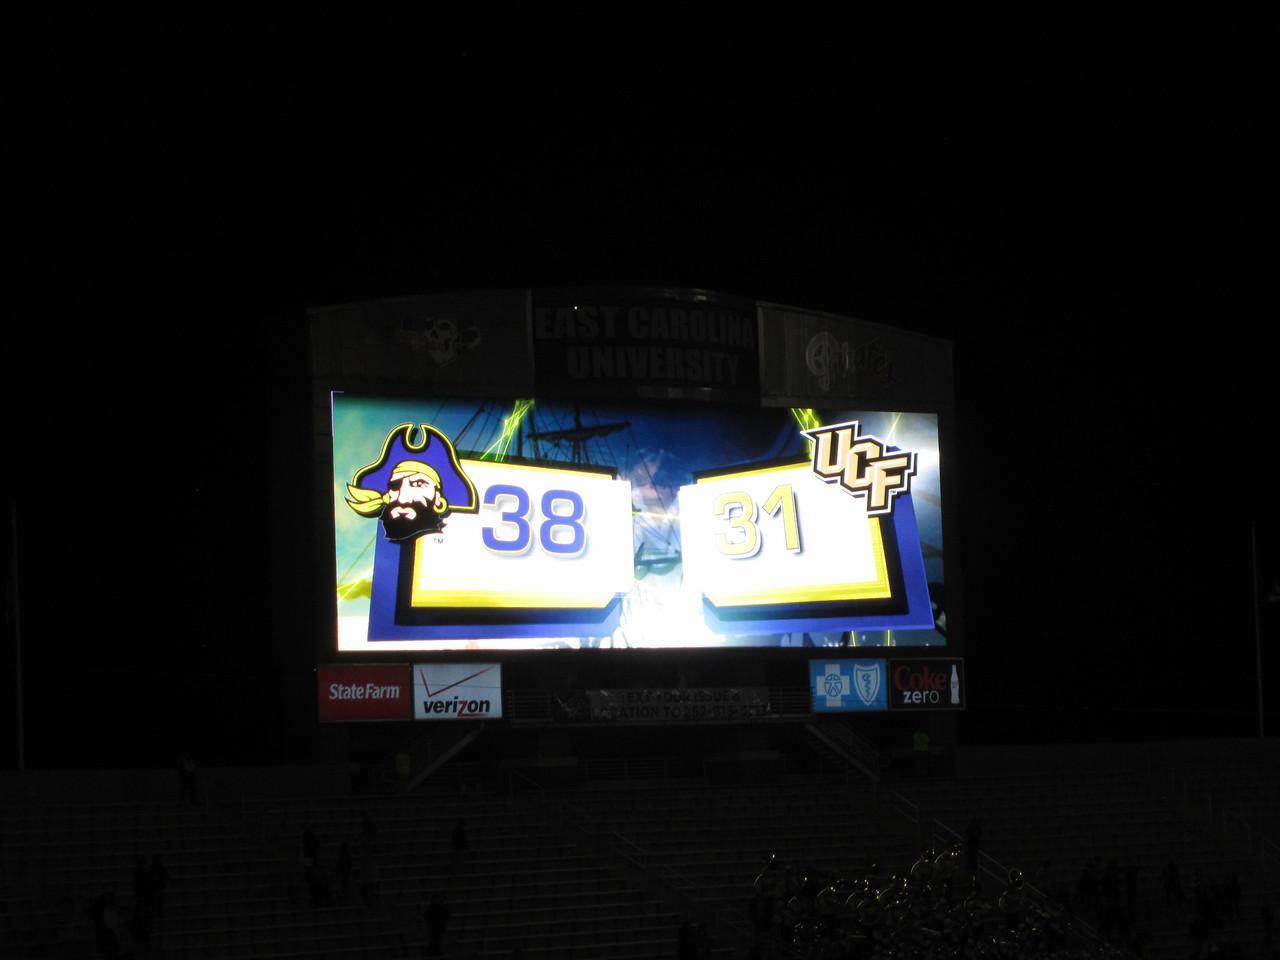 11/19/2011 ECU vs University of Central Florida - 38-31